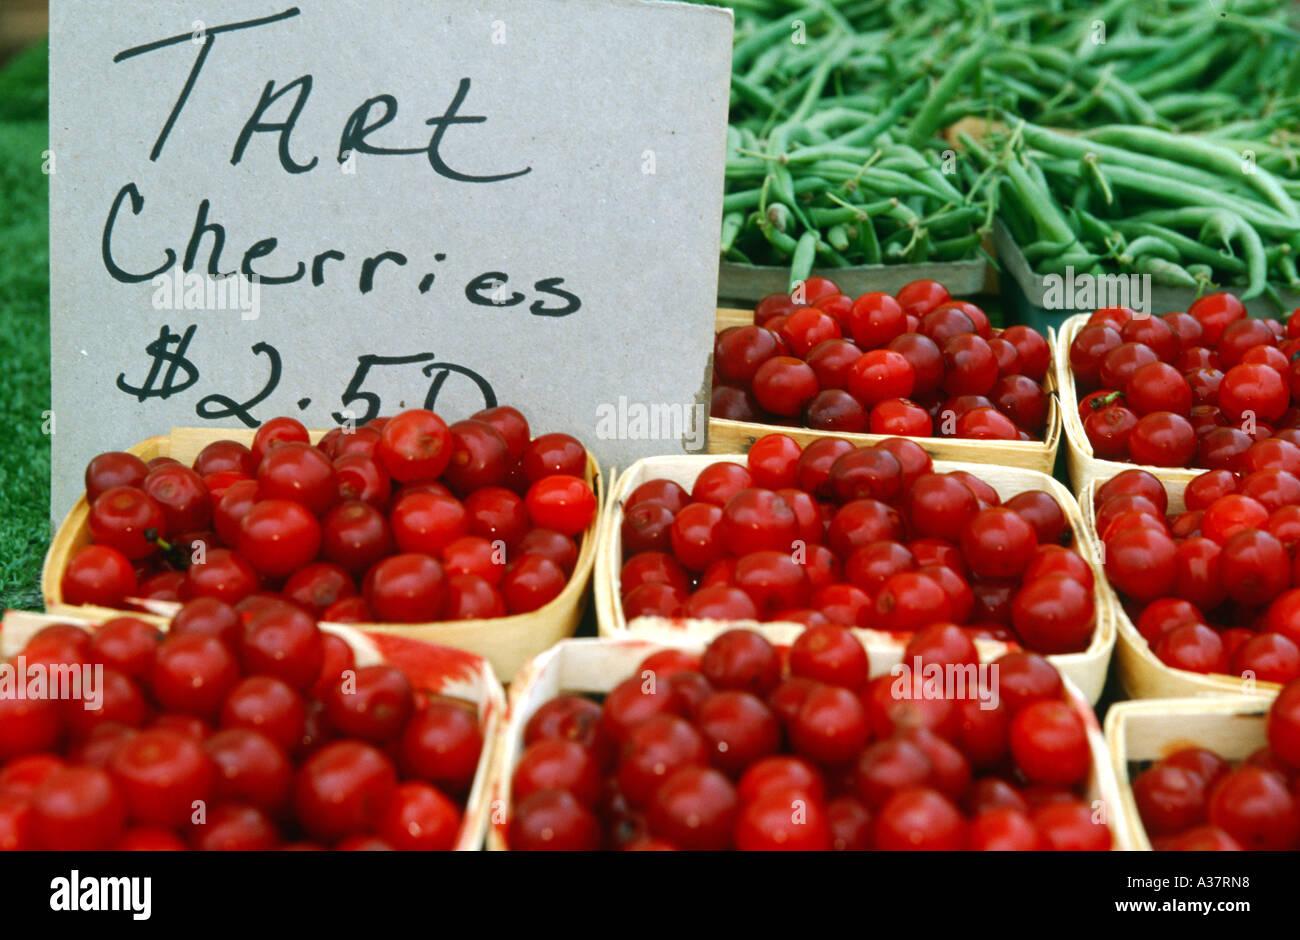 FRUIT Deerfield Illinois Pint baskets of tart Michigan cherries